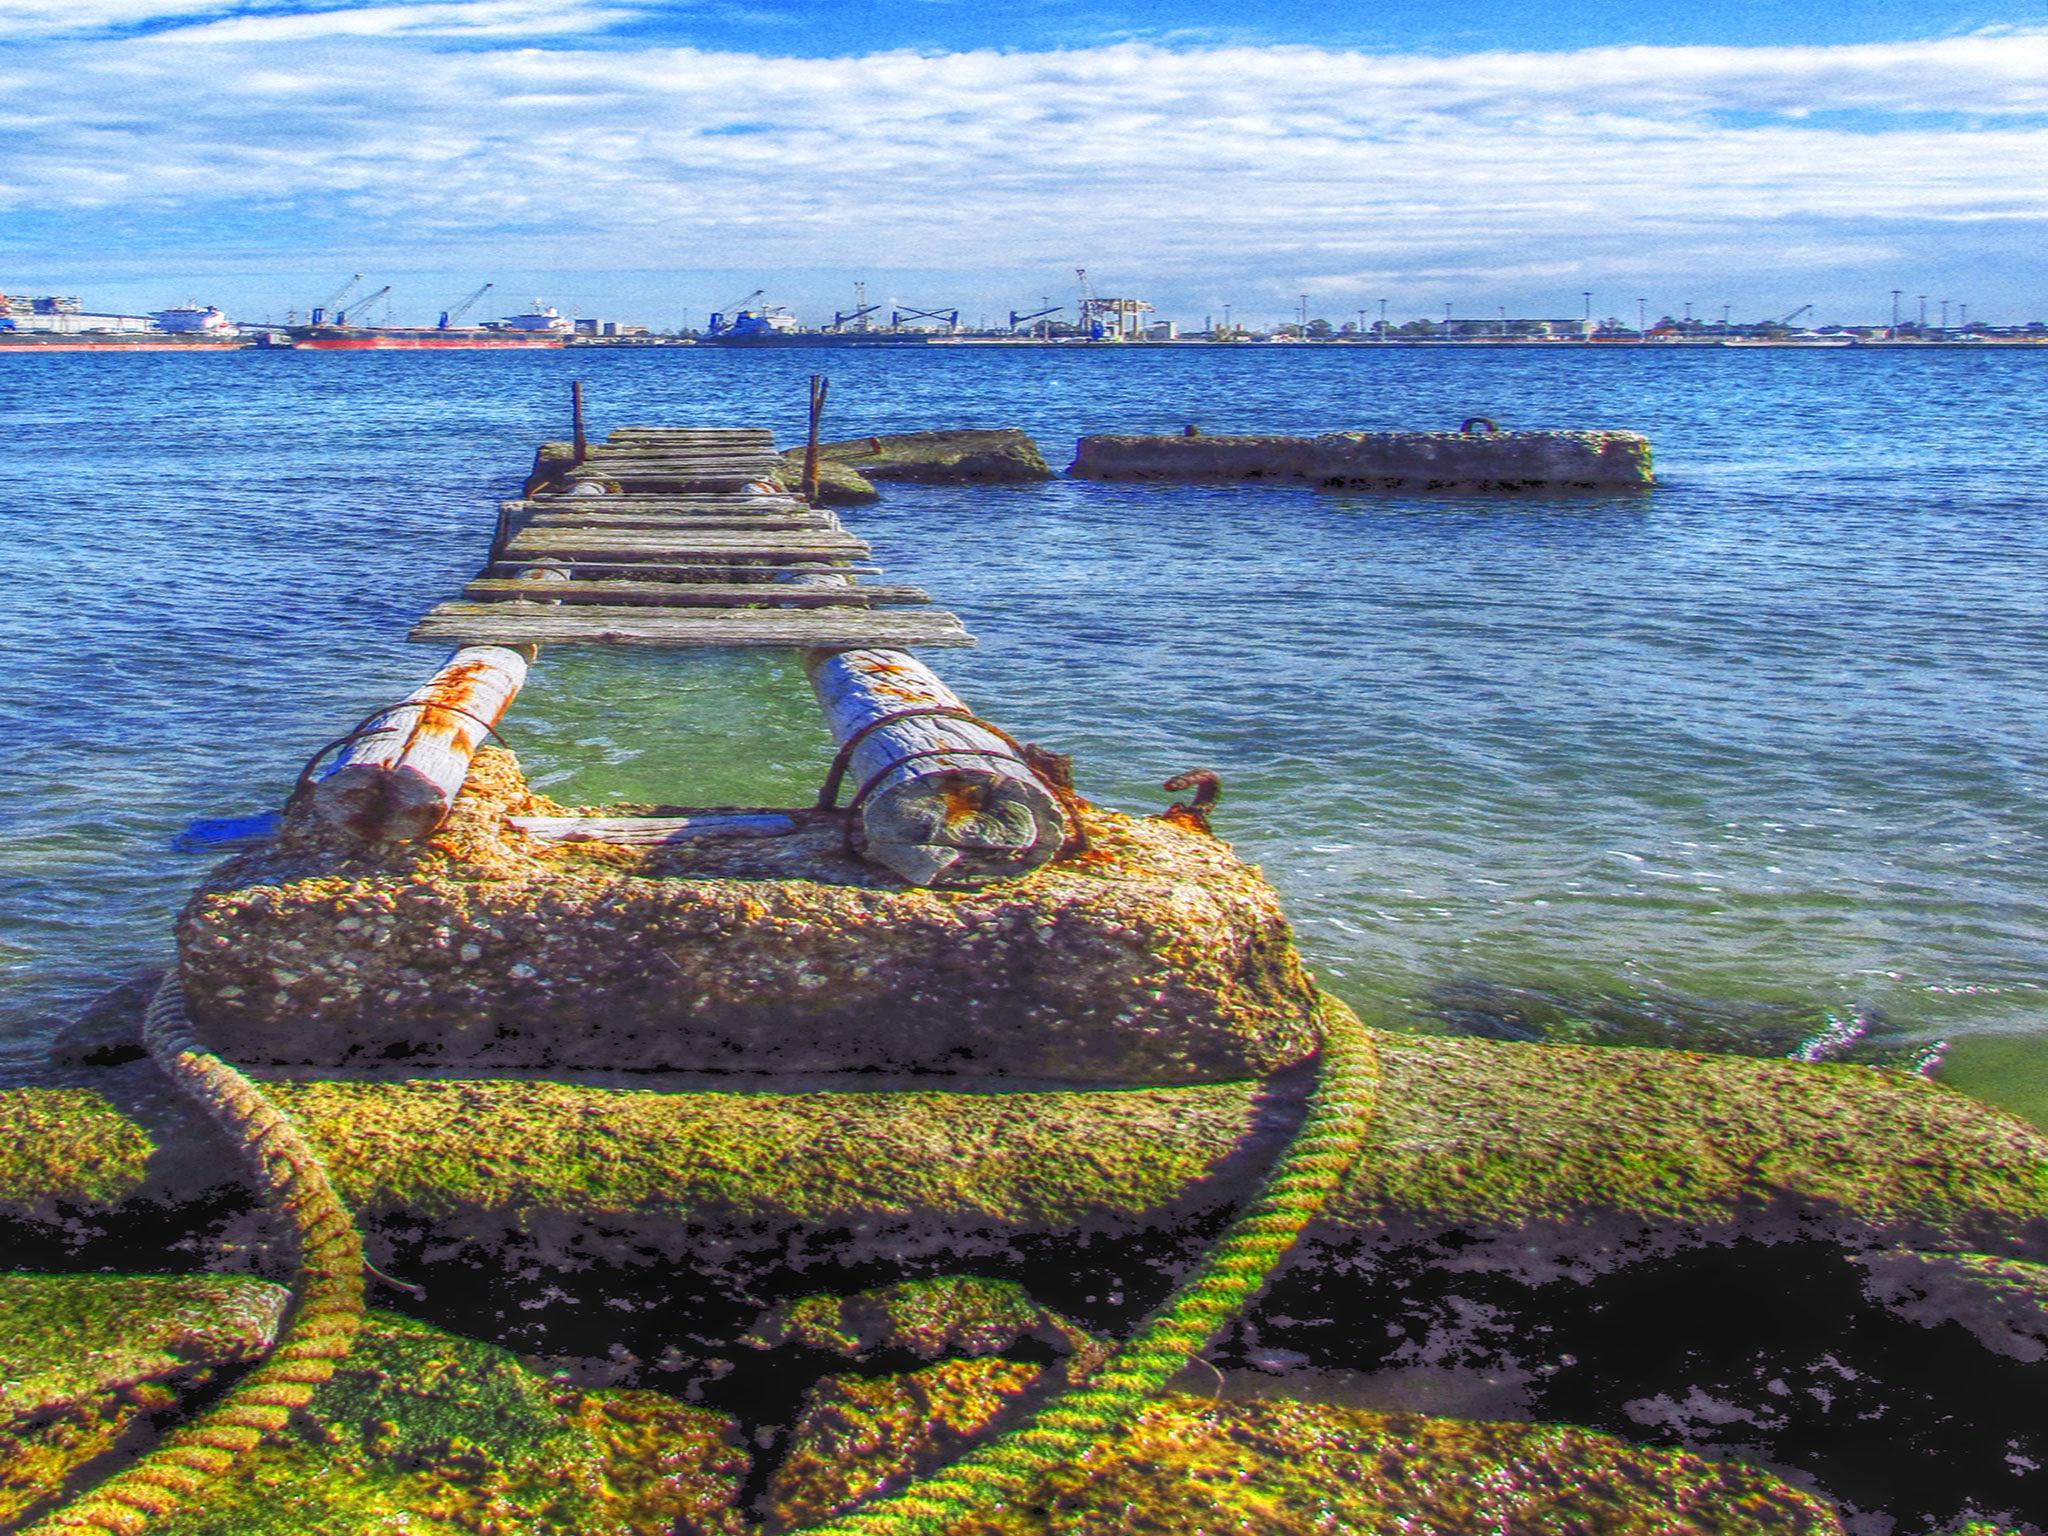 Old Pier by garrisidaniele